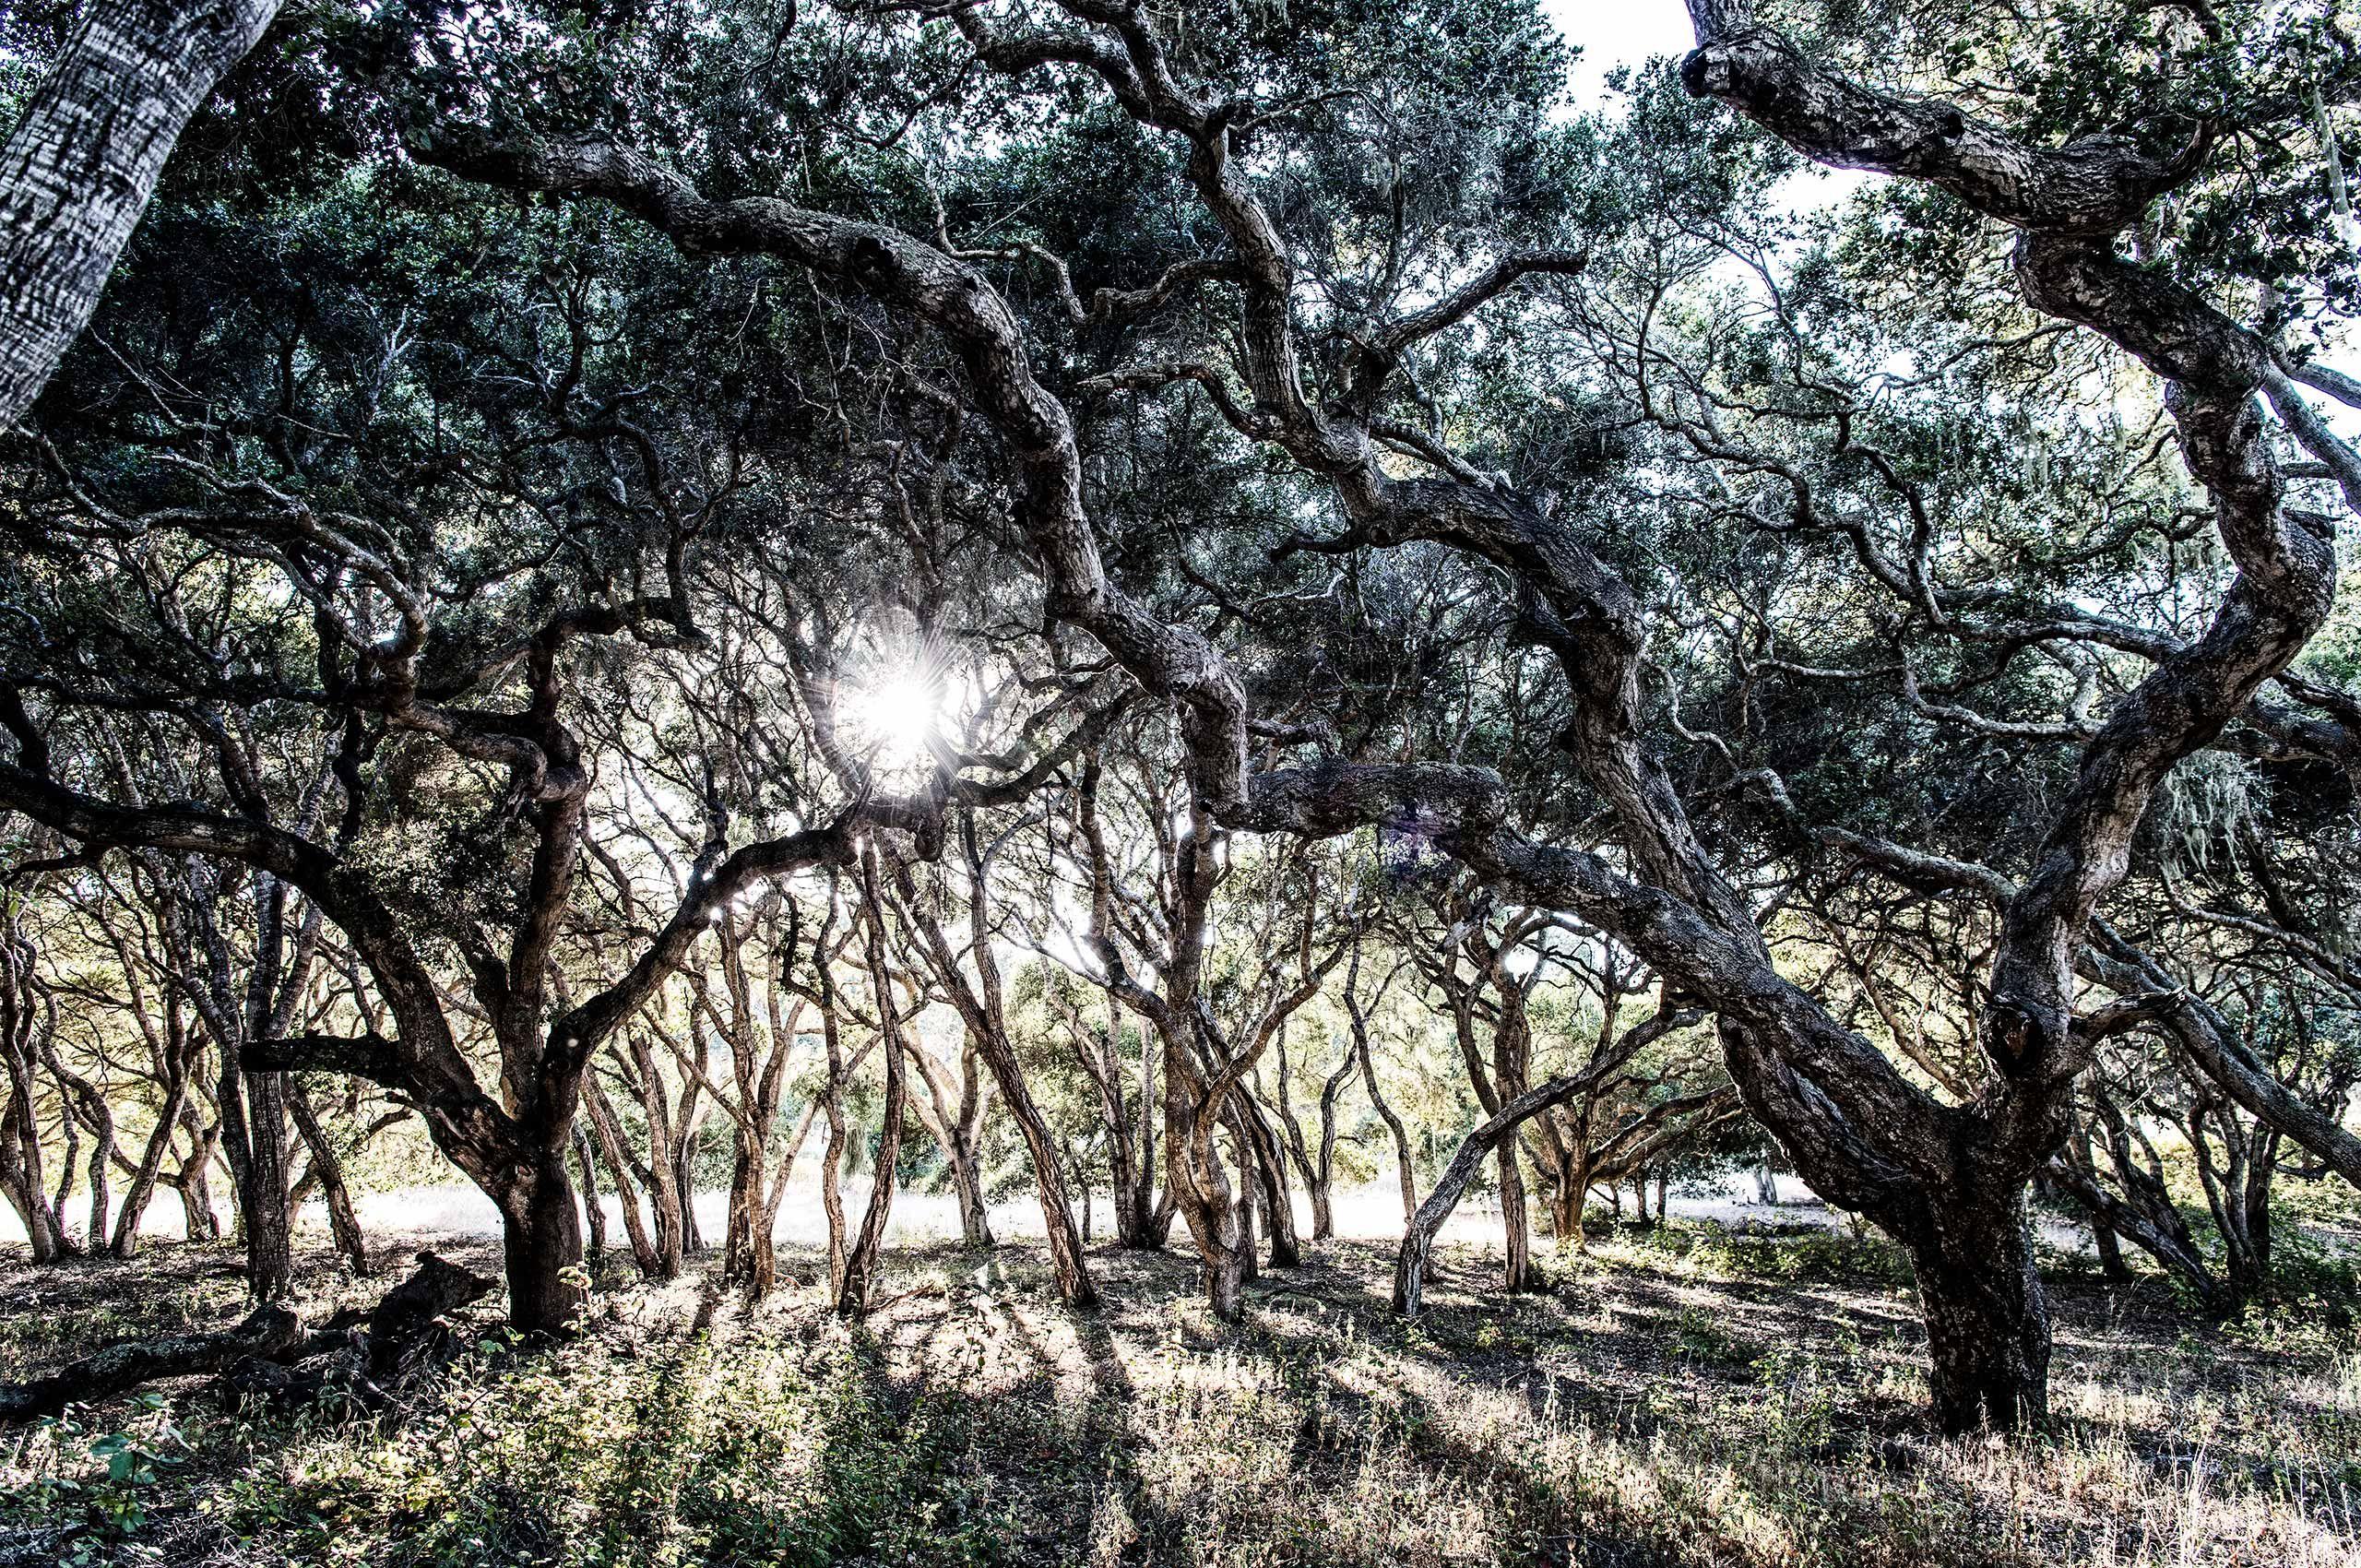 Trees-Sun-Walden-Monterey-HenrikOlundPhotography.jpg